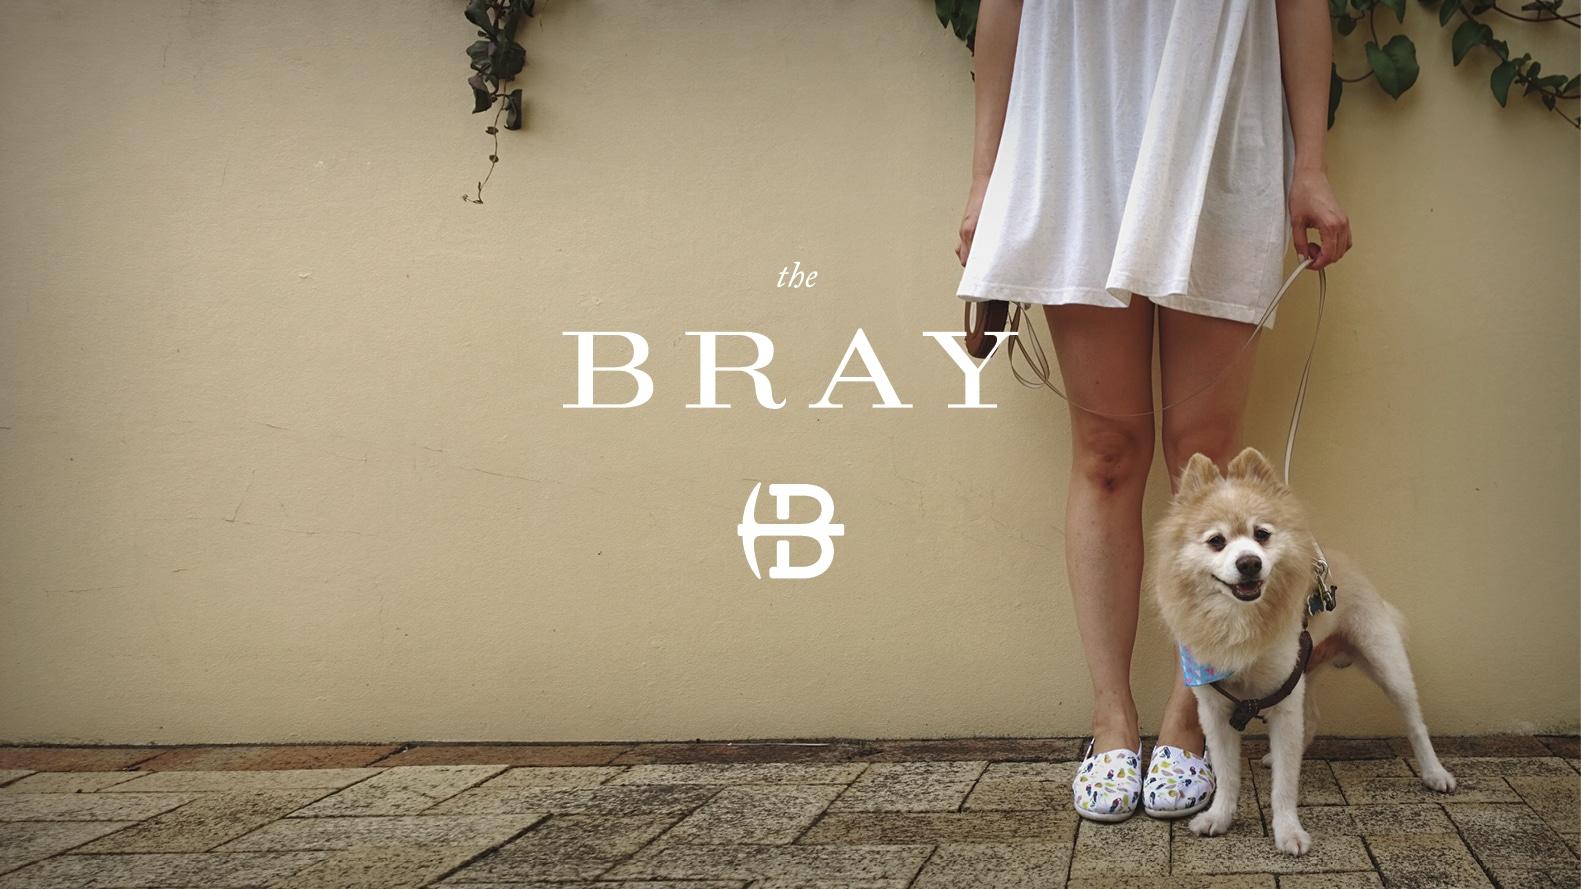 girl walking dog at the Bray